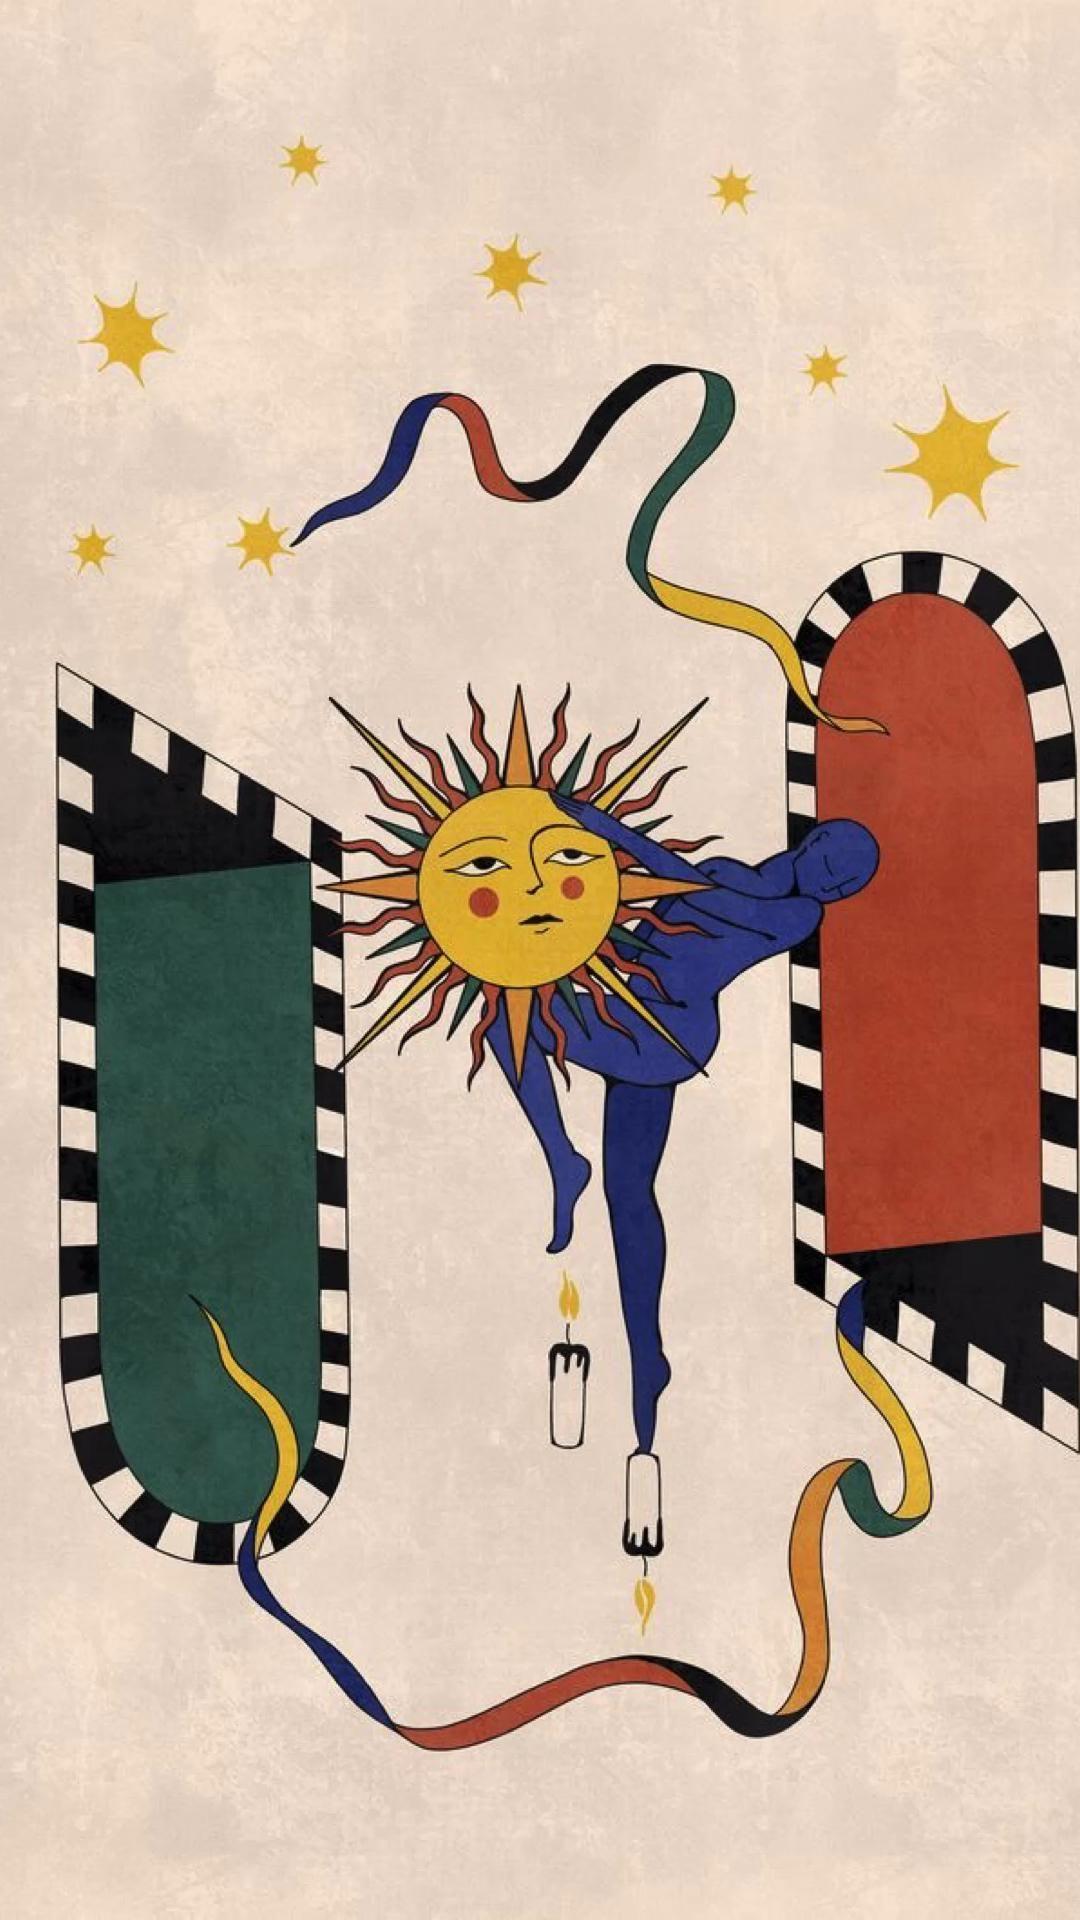 Wallpaper Phone | Wall Posters | Minimalist | Sun | Inspo Cool